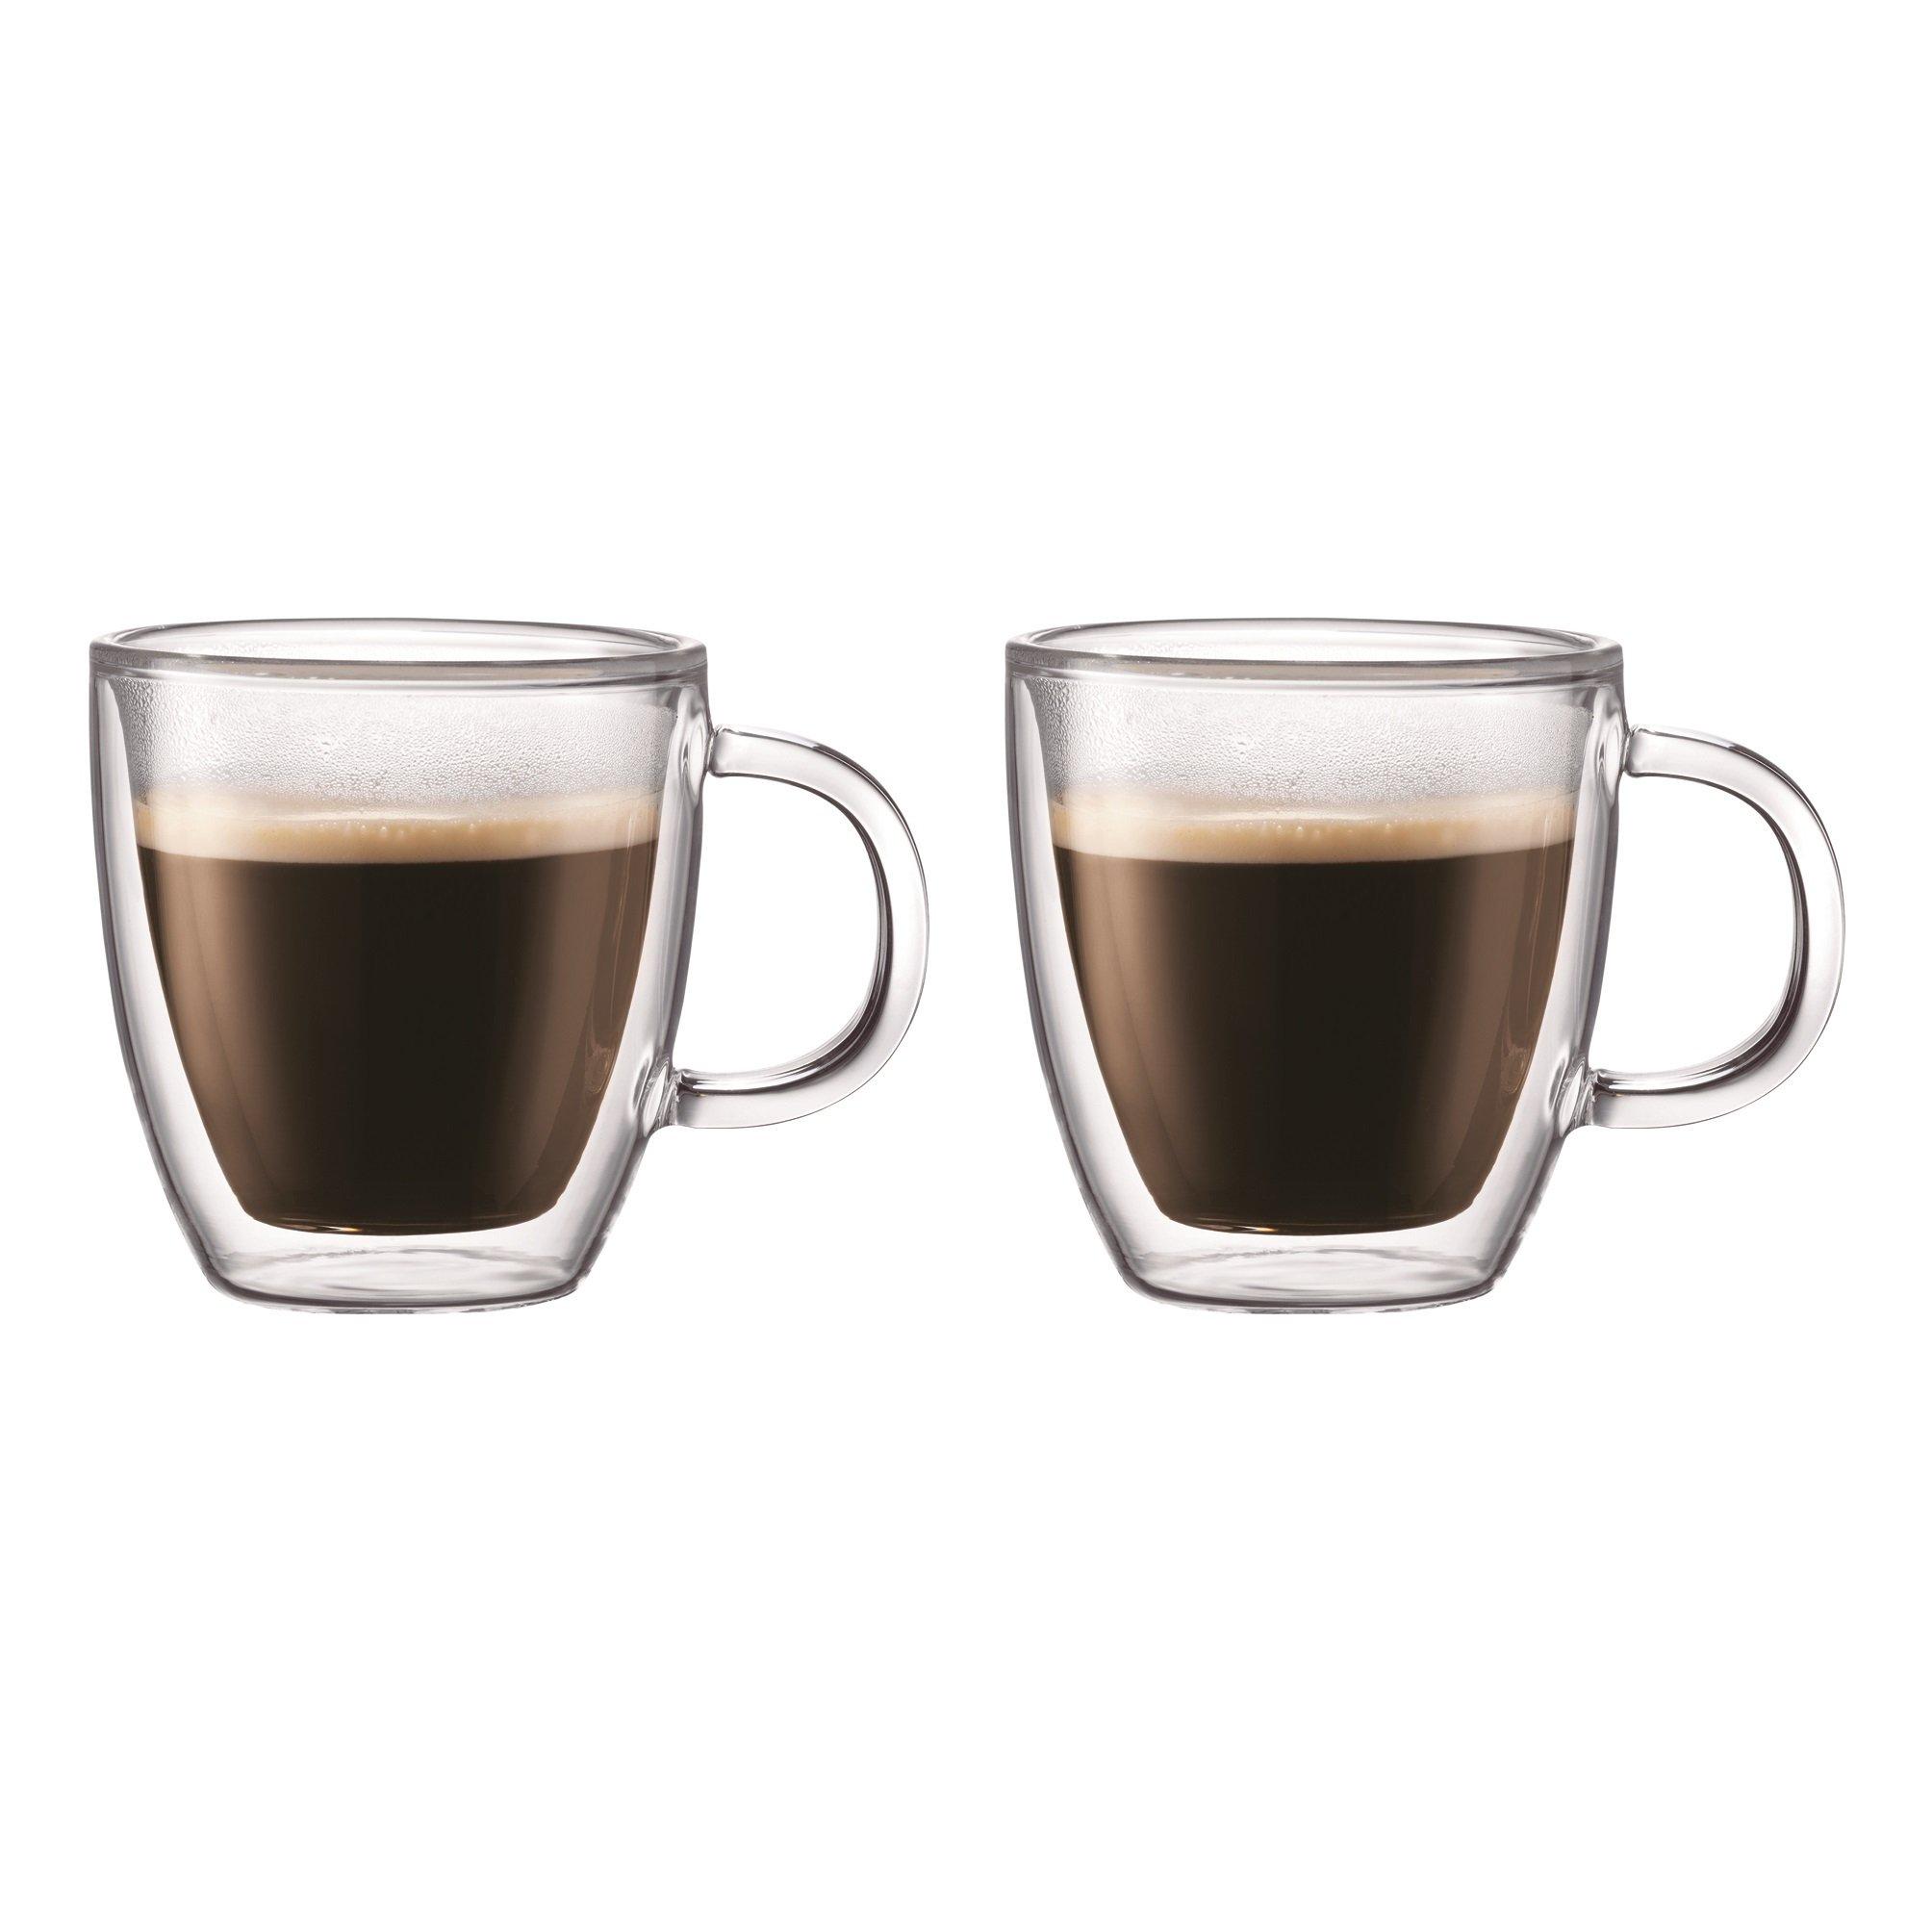 bodum bistro coffee mug double wall insulated glass espresso mugs clear 5 732233484400 ebay. Black Bedroom Furniture Sets. Home Design Ideas